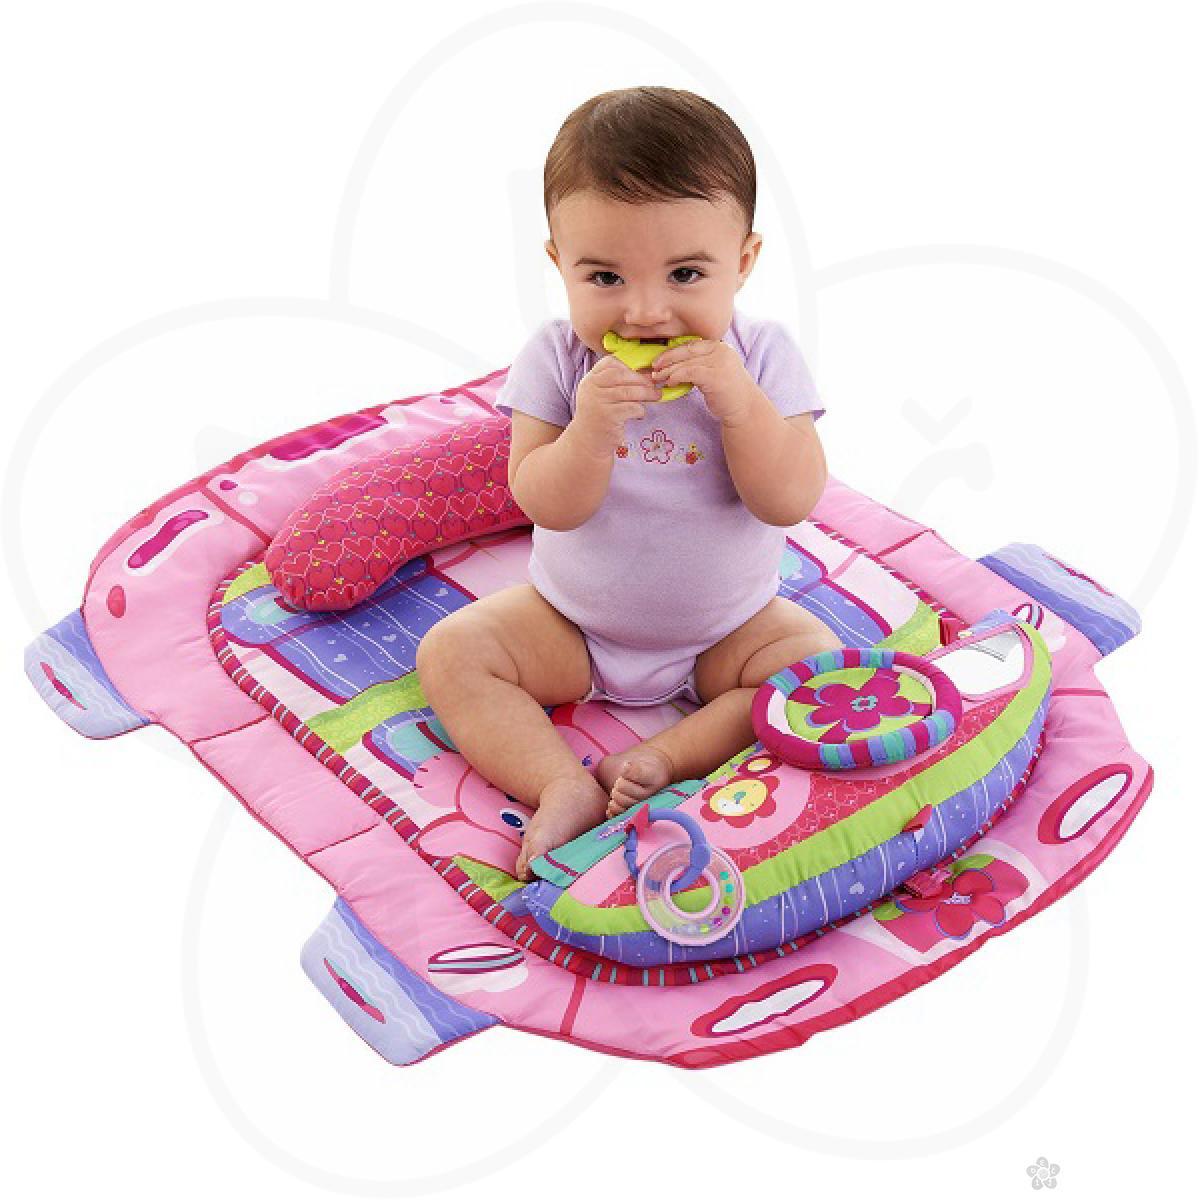 Podloga za Igranje Pretty in Pink Tummy Cruiser SKU9299